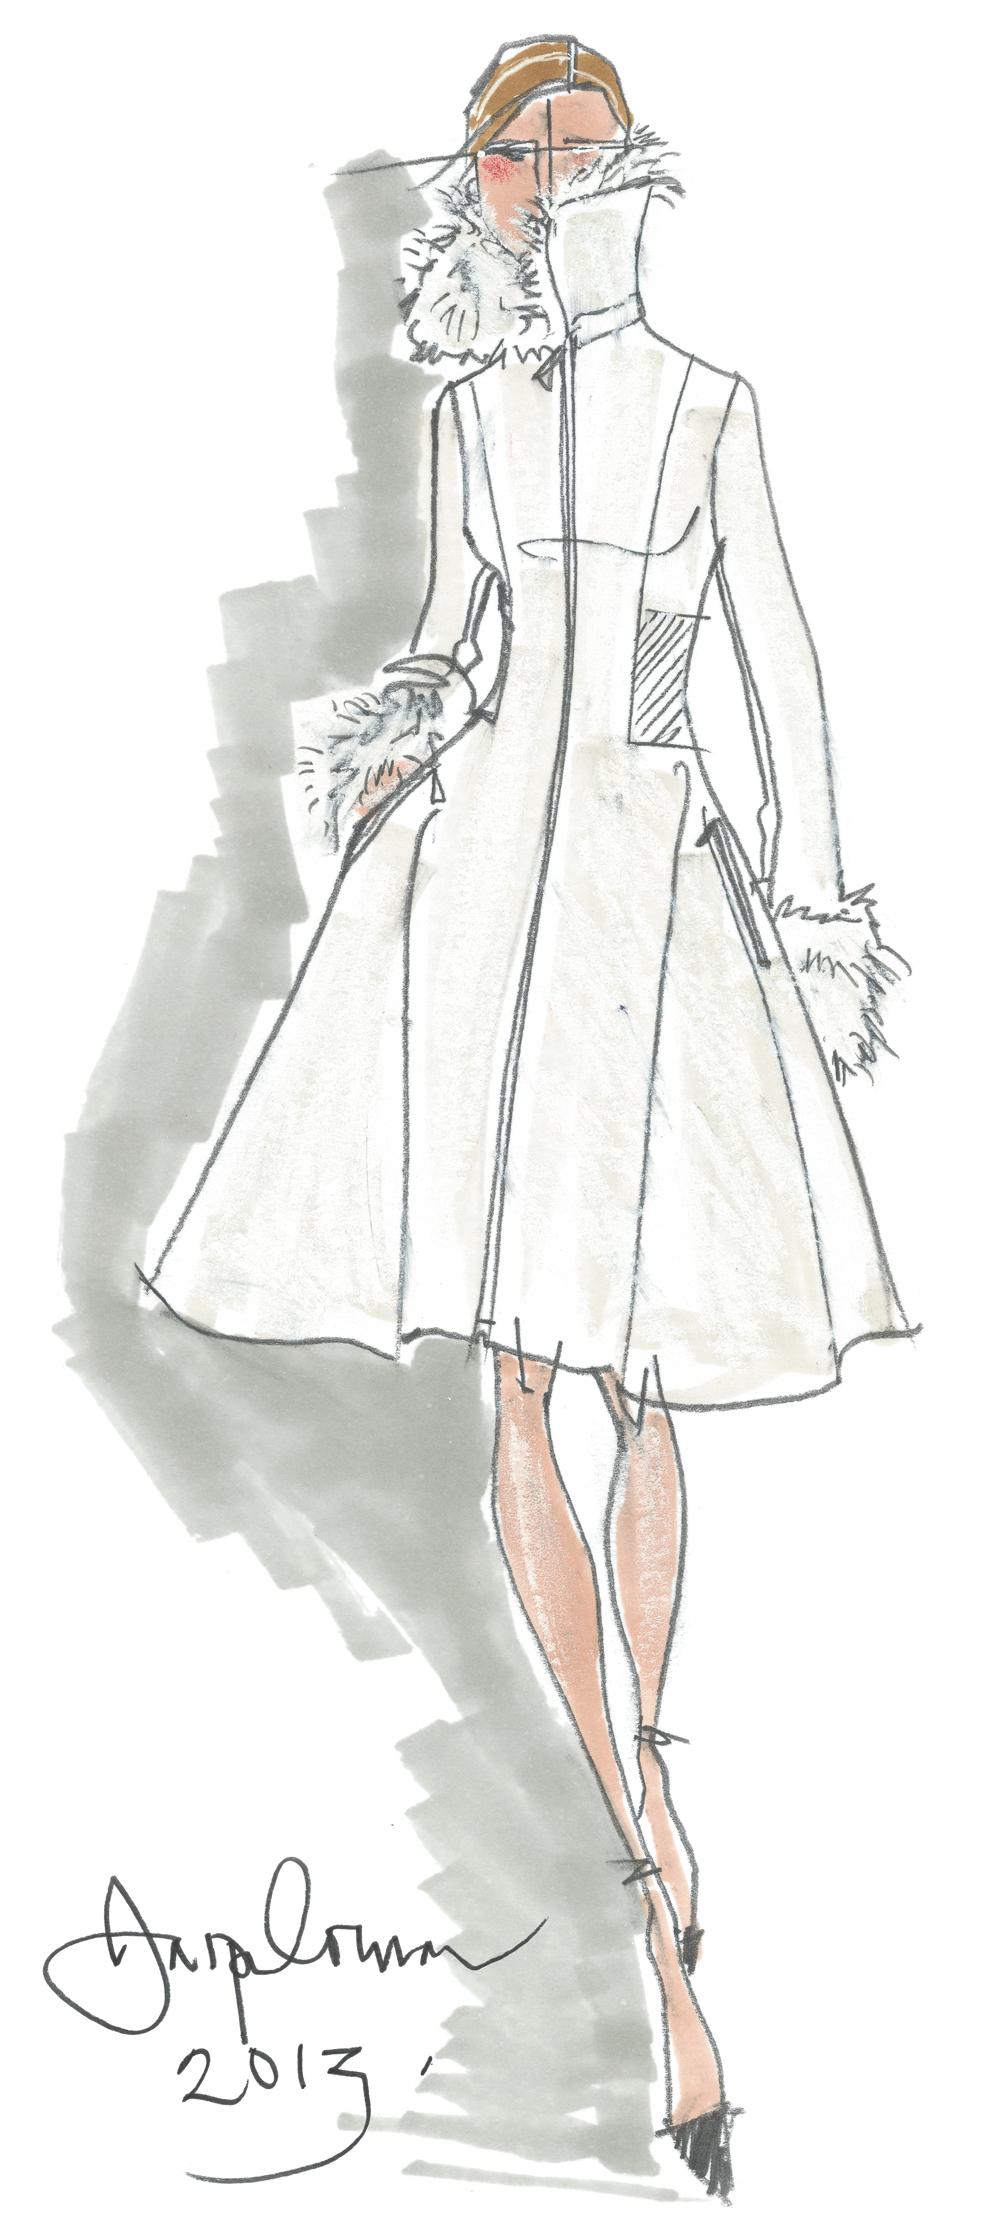 Drawn tears fashion model Coat Bride sketch Sketches Drawn